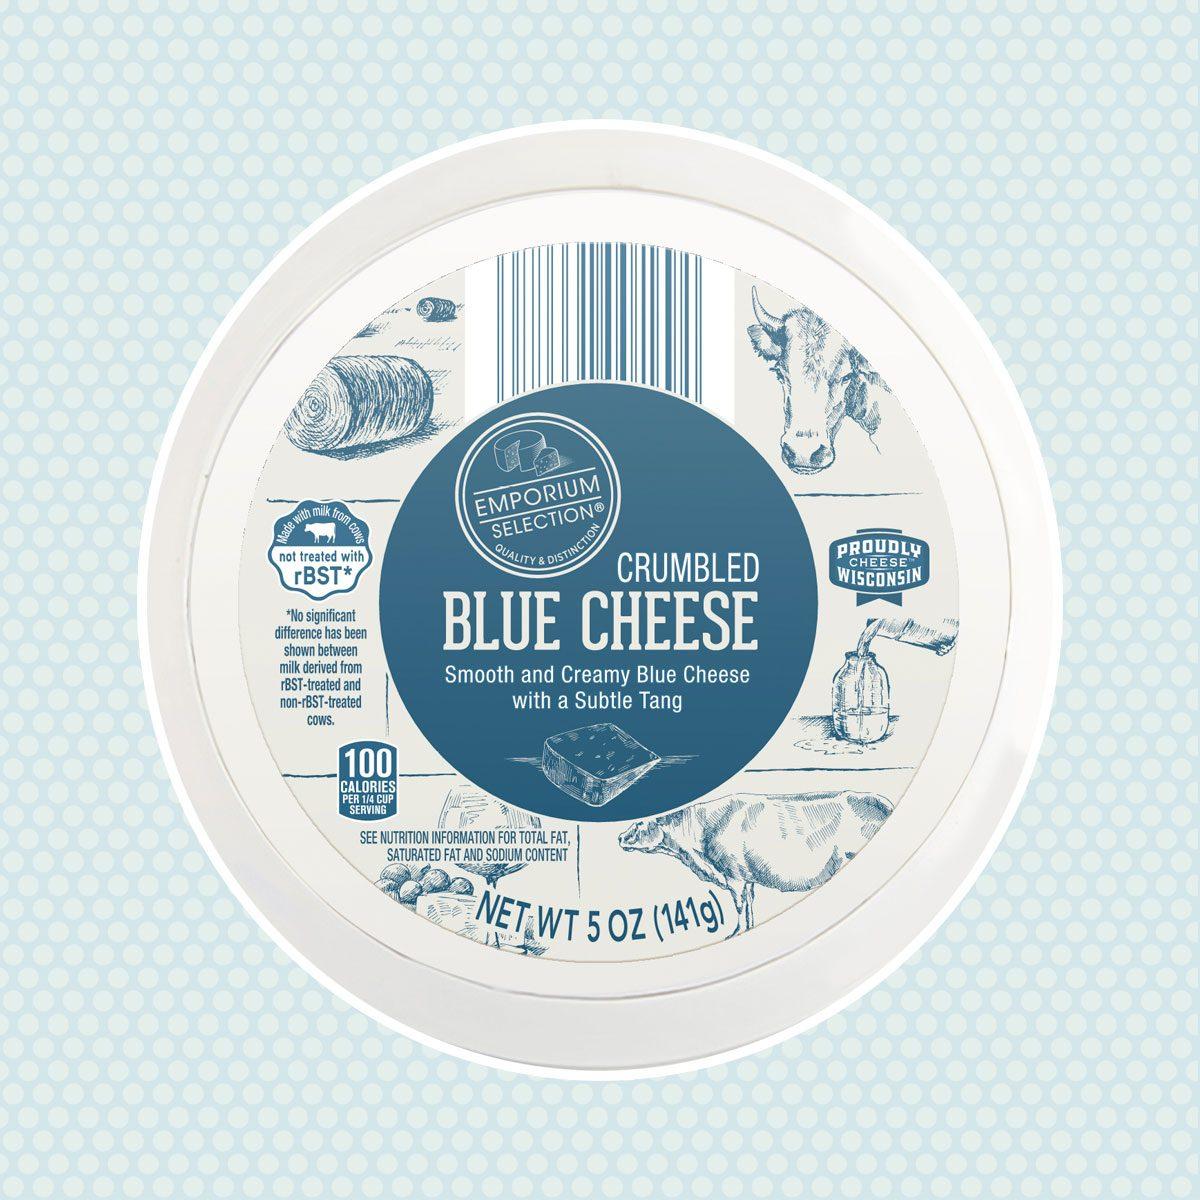 Crumbled Blue Cheese